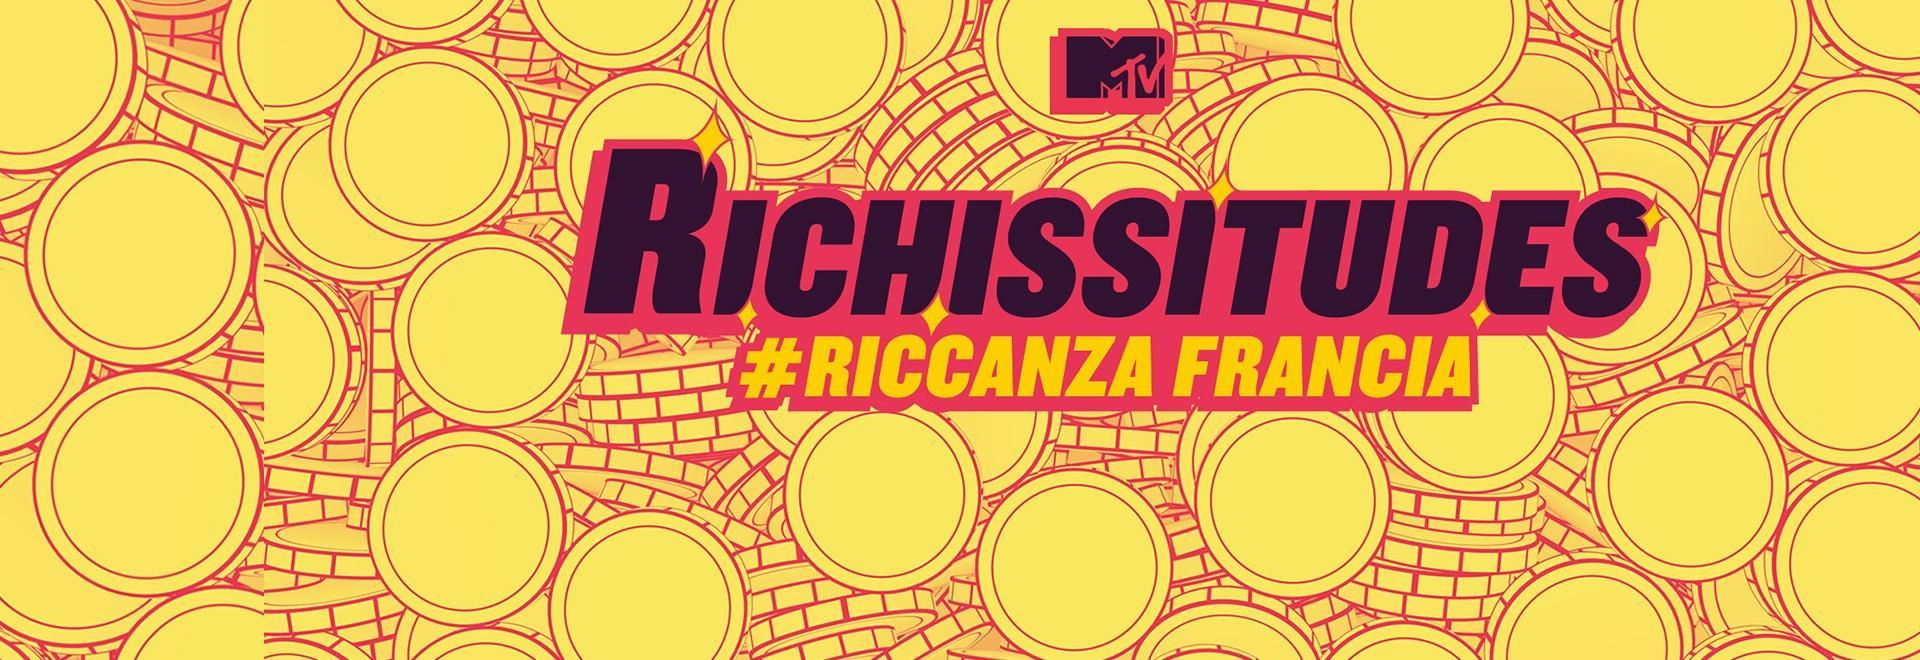 Richissitudes - #Riccanza Francia